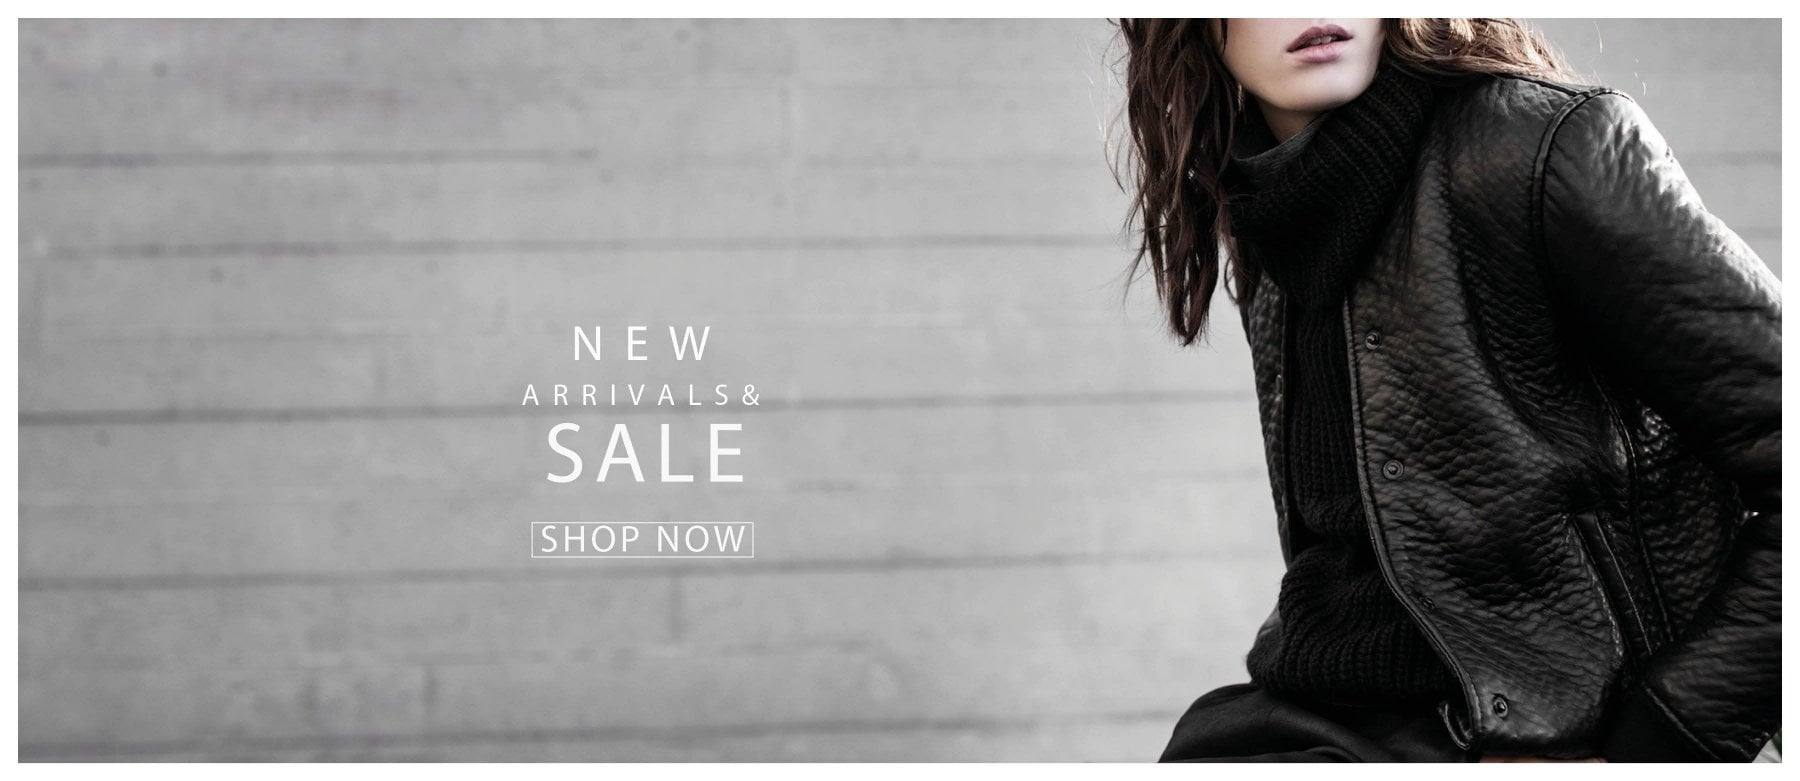 New arrivals & sale